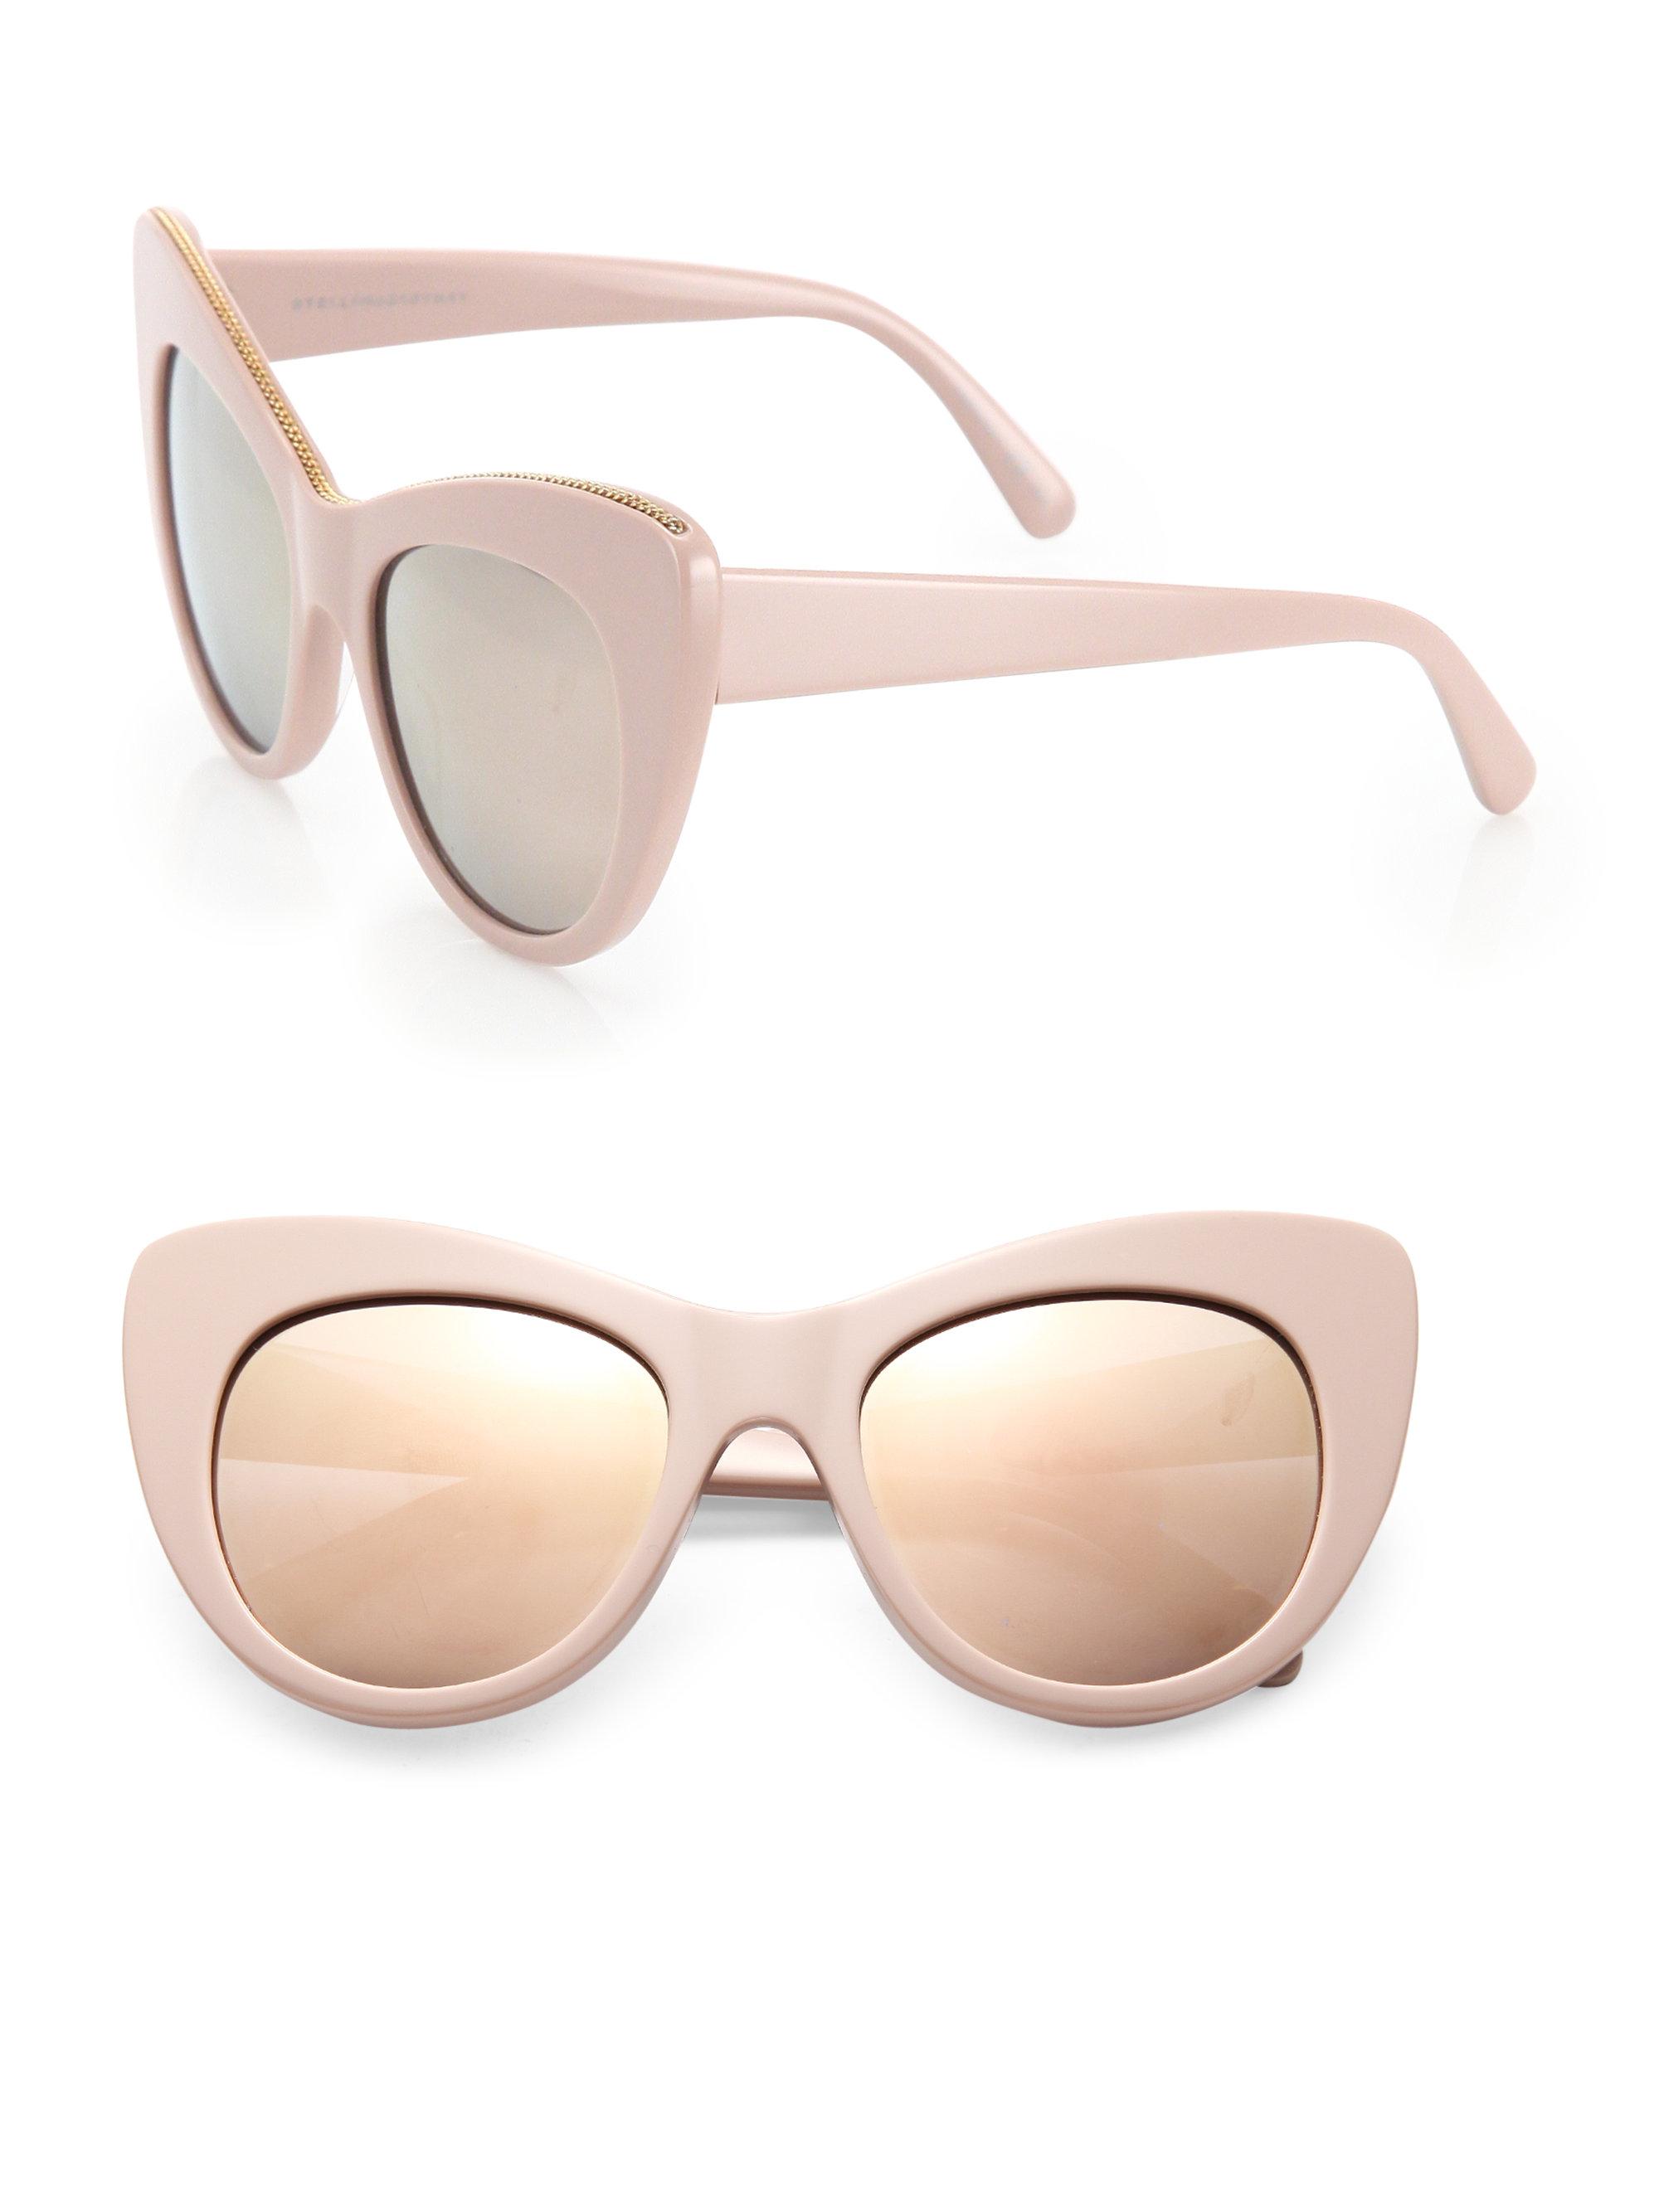 600aee7a87 Stella mccartney Falabella Chain 53mm Oversized Cat Eye ... Lyst - Stella  Mccartney Black Cat Eye Sunglasses ...